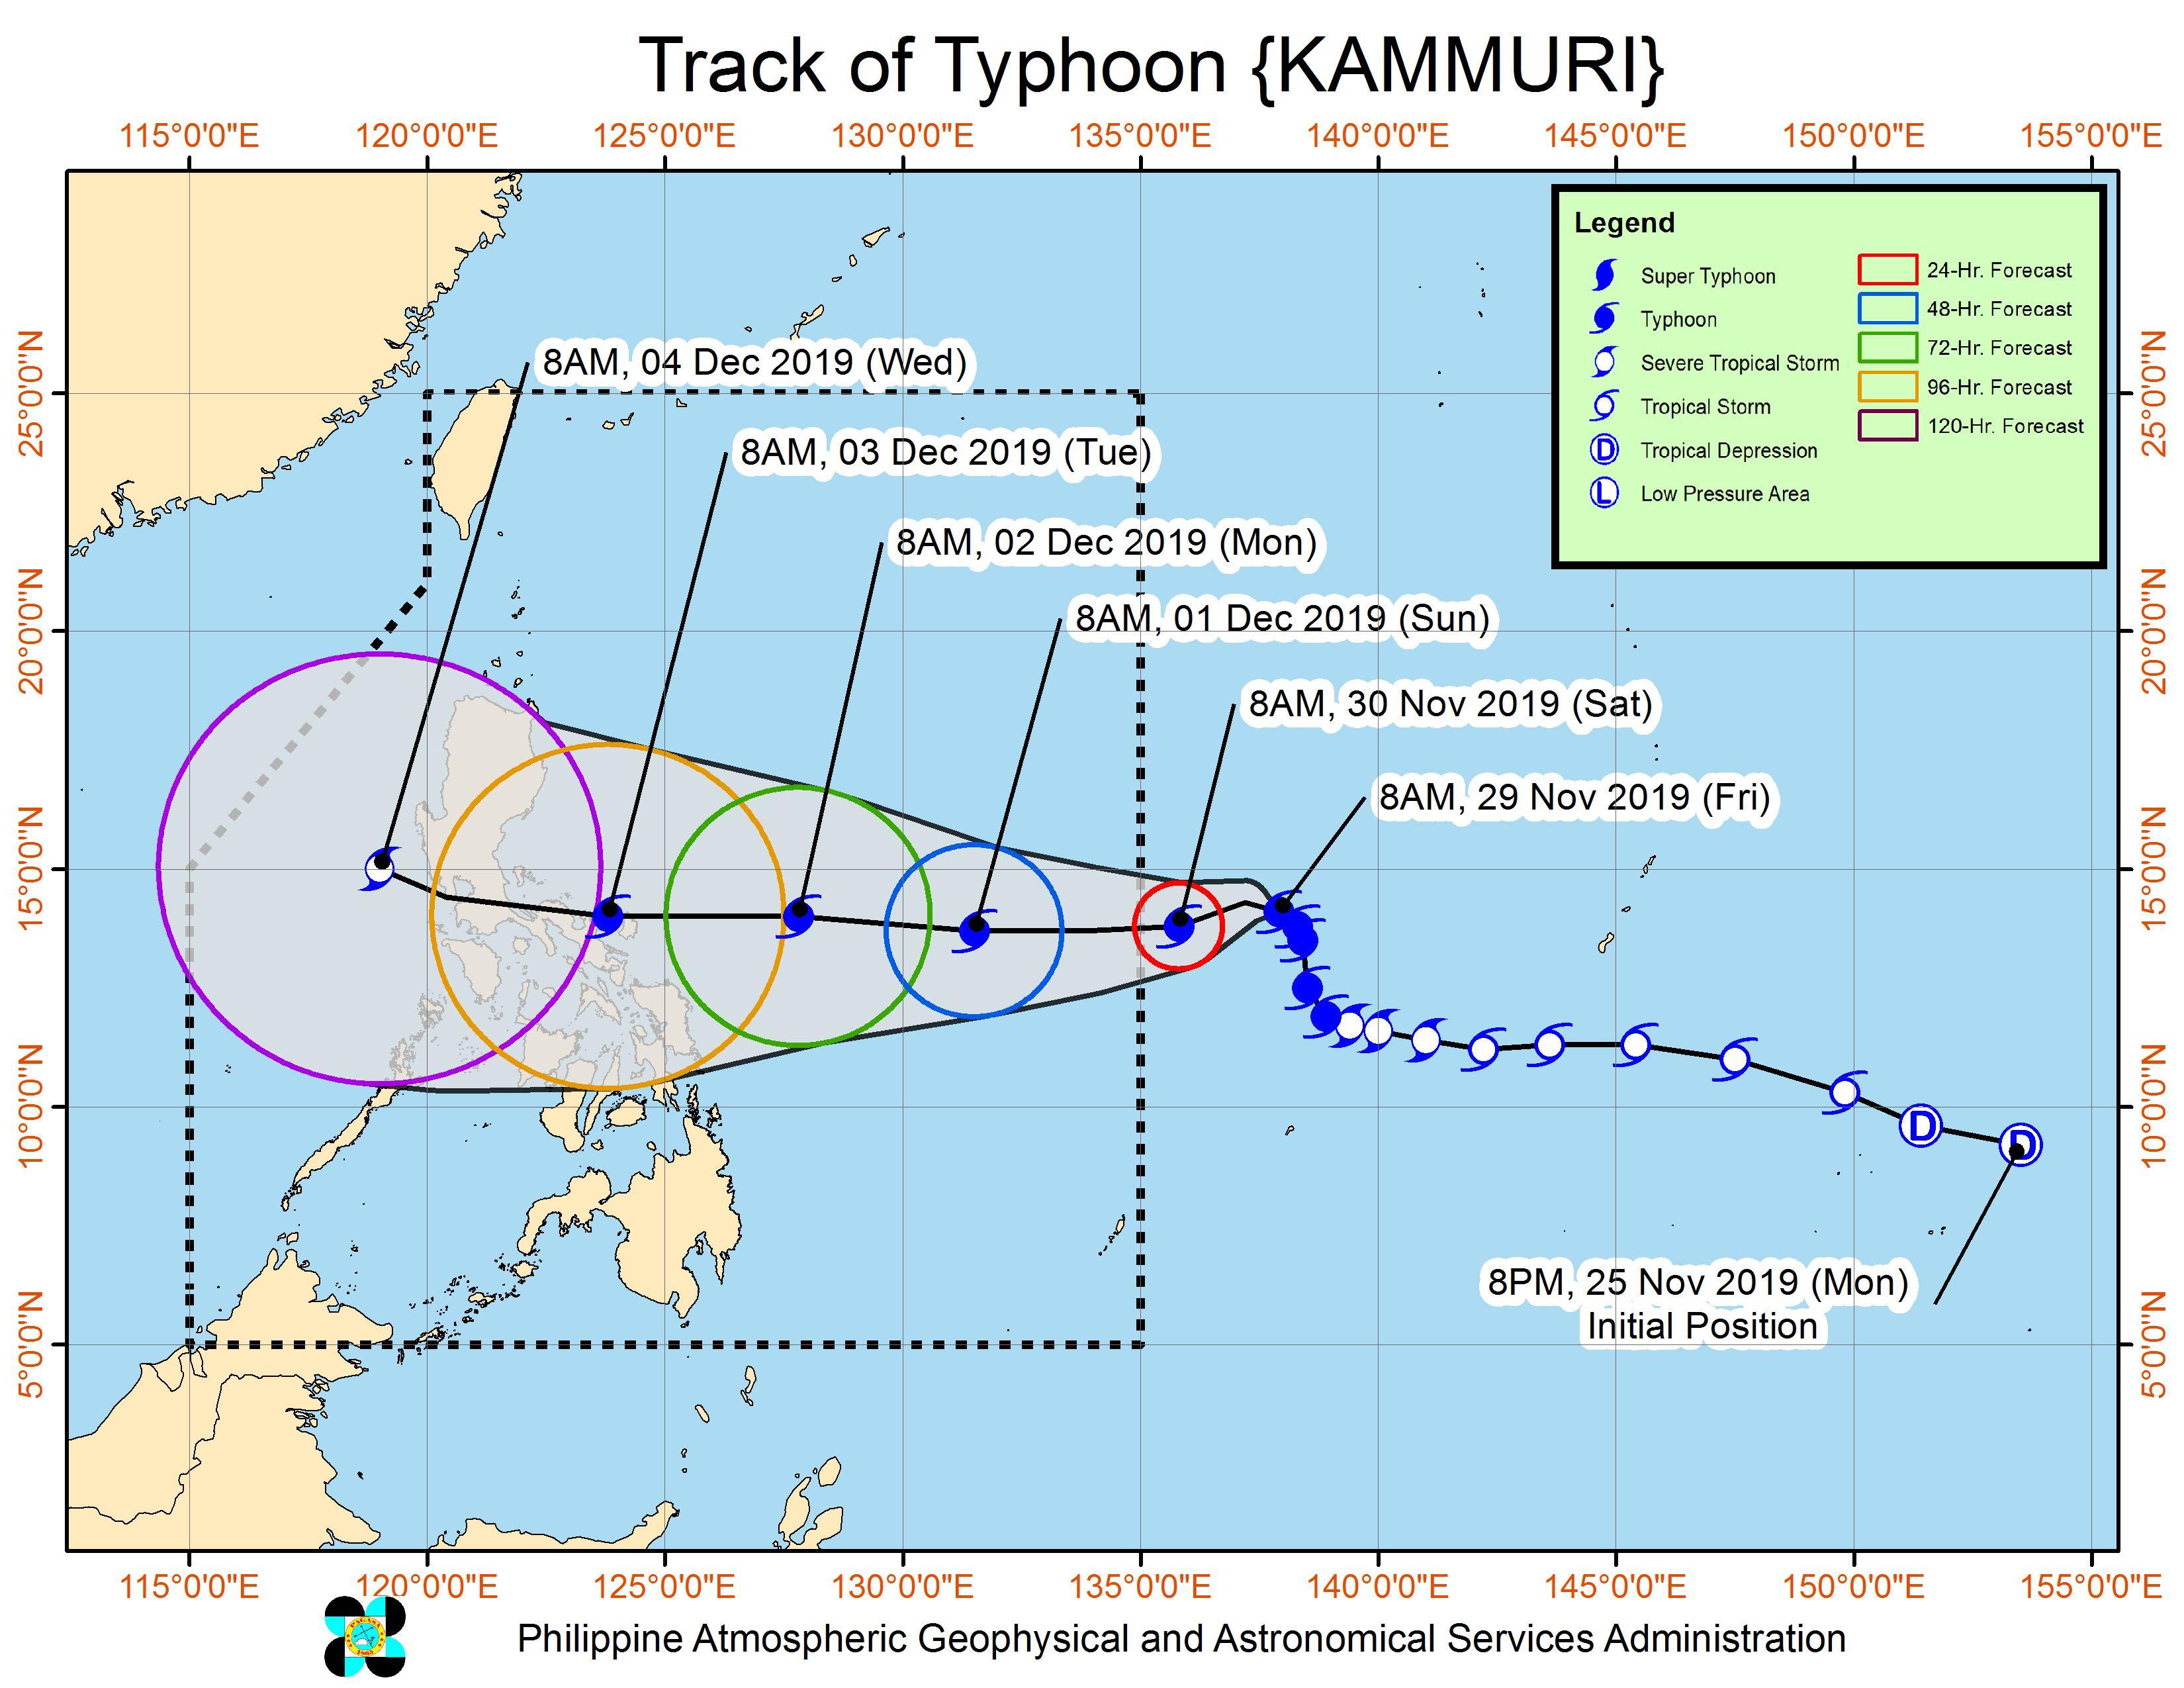 Forecast track of Typhoon Kammuri as of November 29, 2019, 11 am. Image from PAGASA